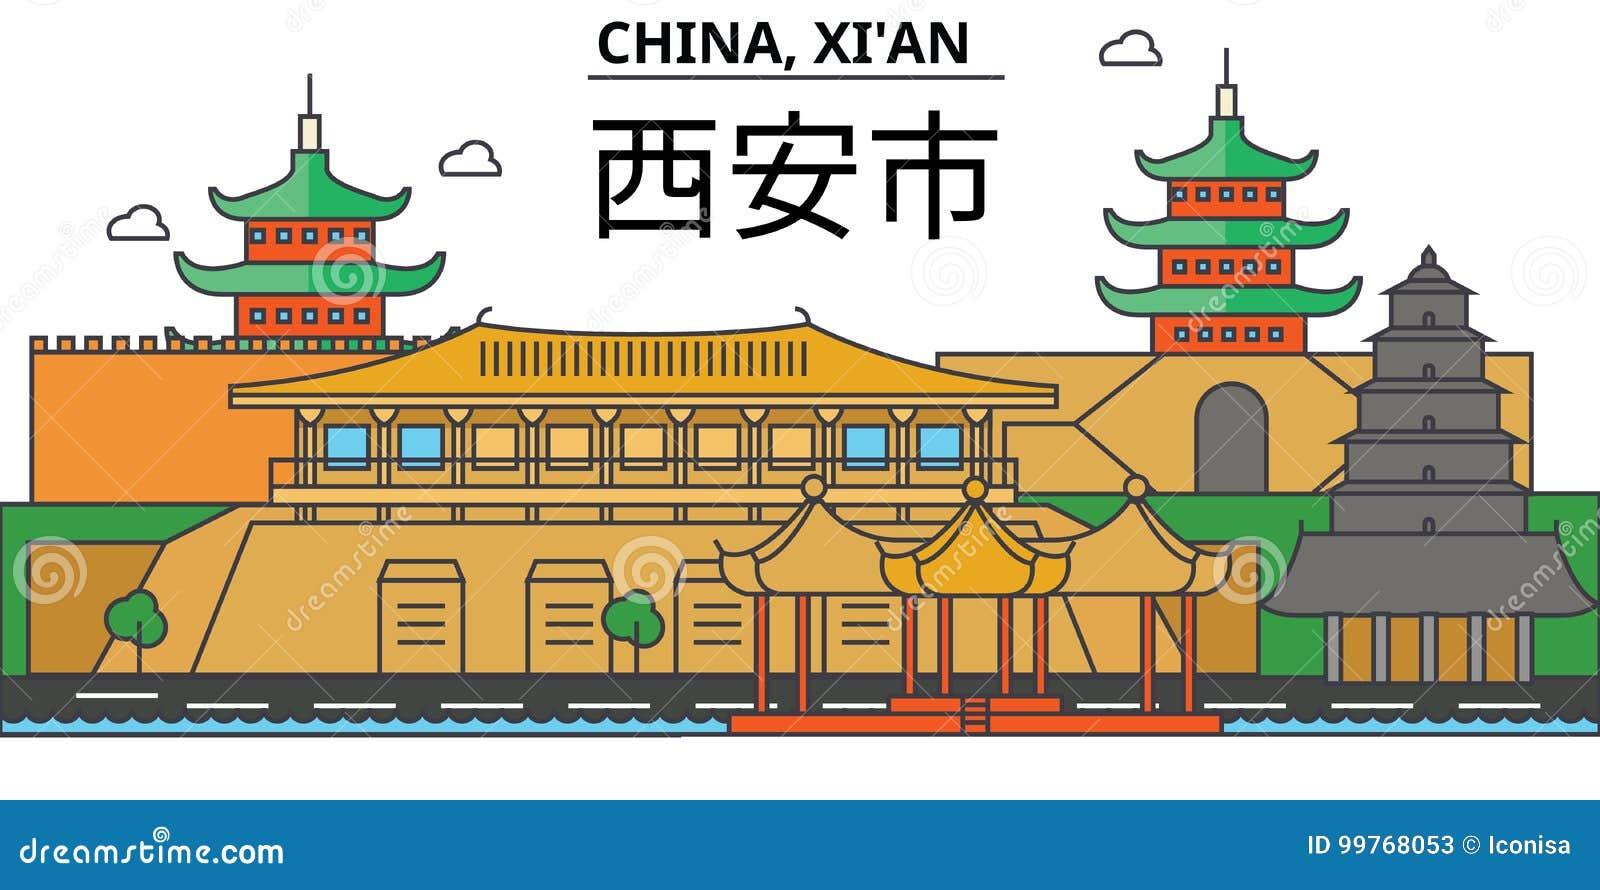 China, Xi De architectuur Editable van de stadshorizon